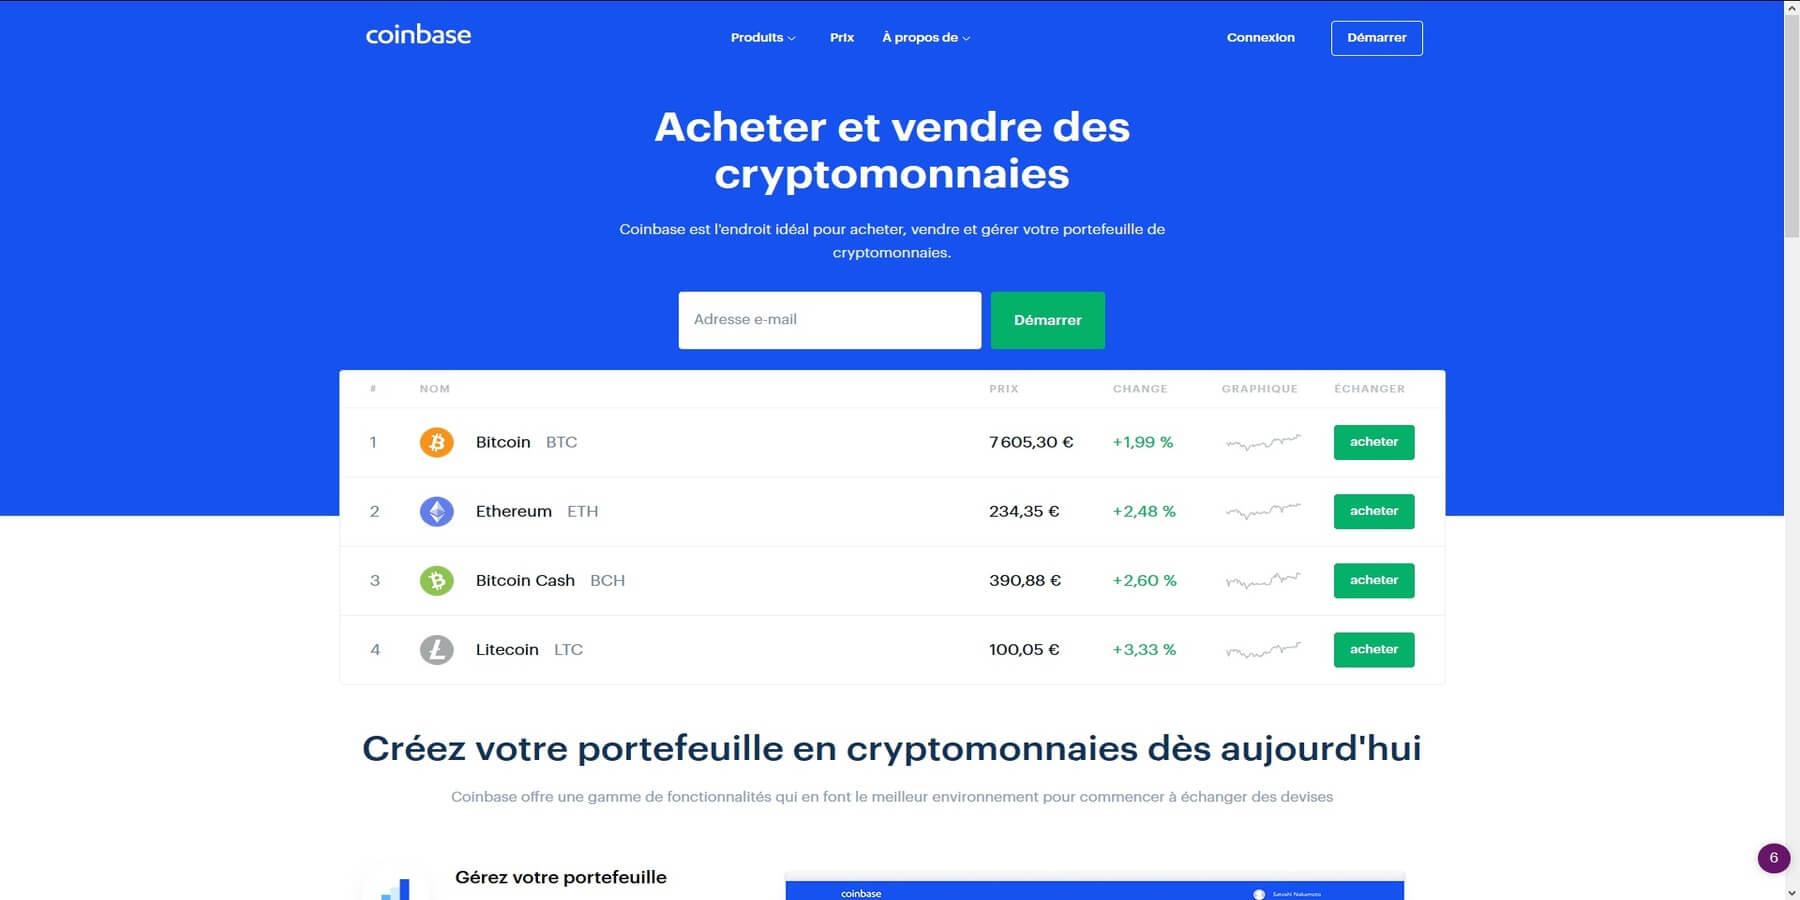 Acheter des cryptomonnaies chez Coinbase